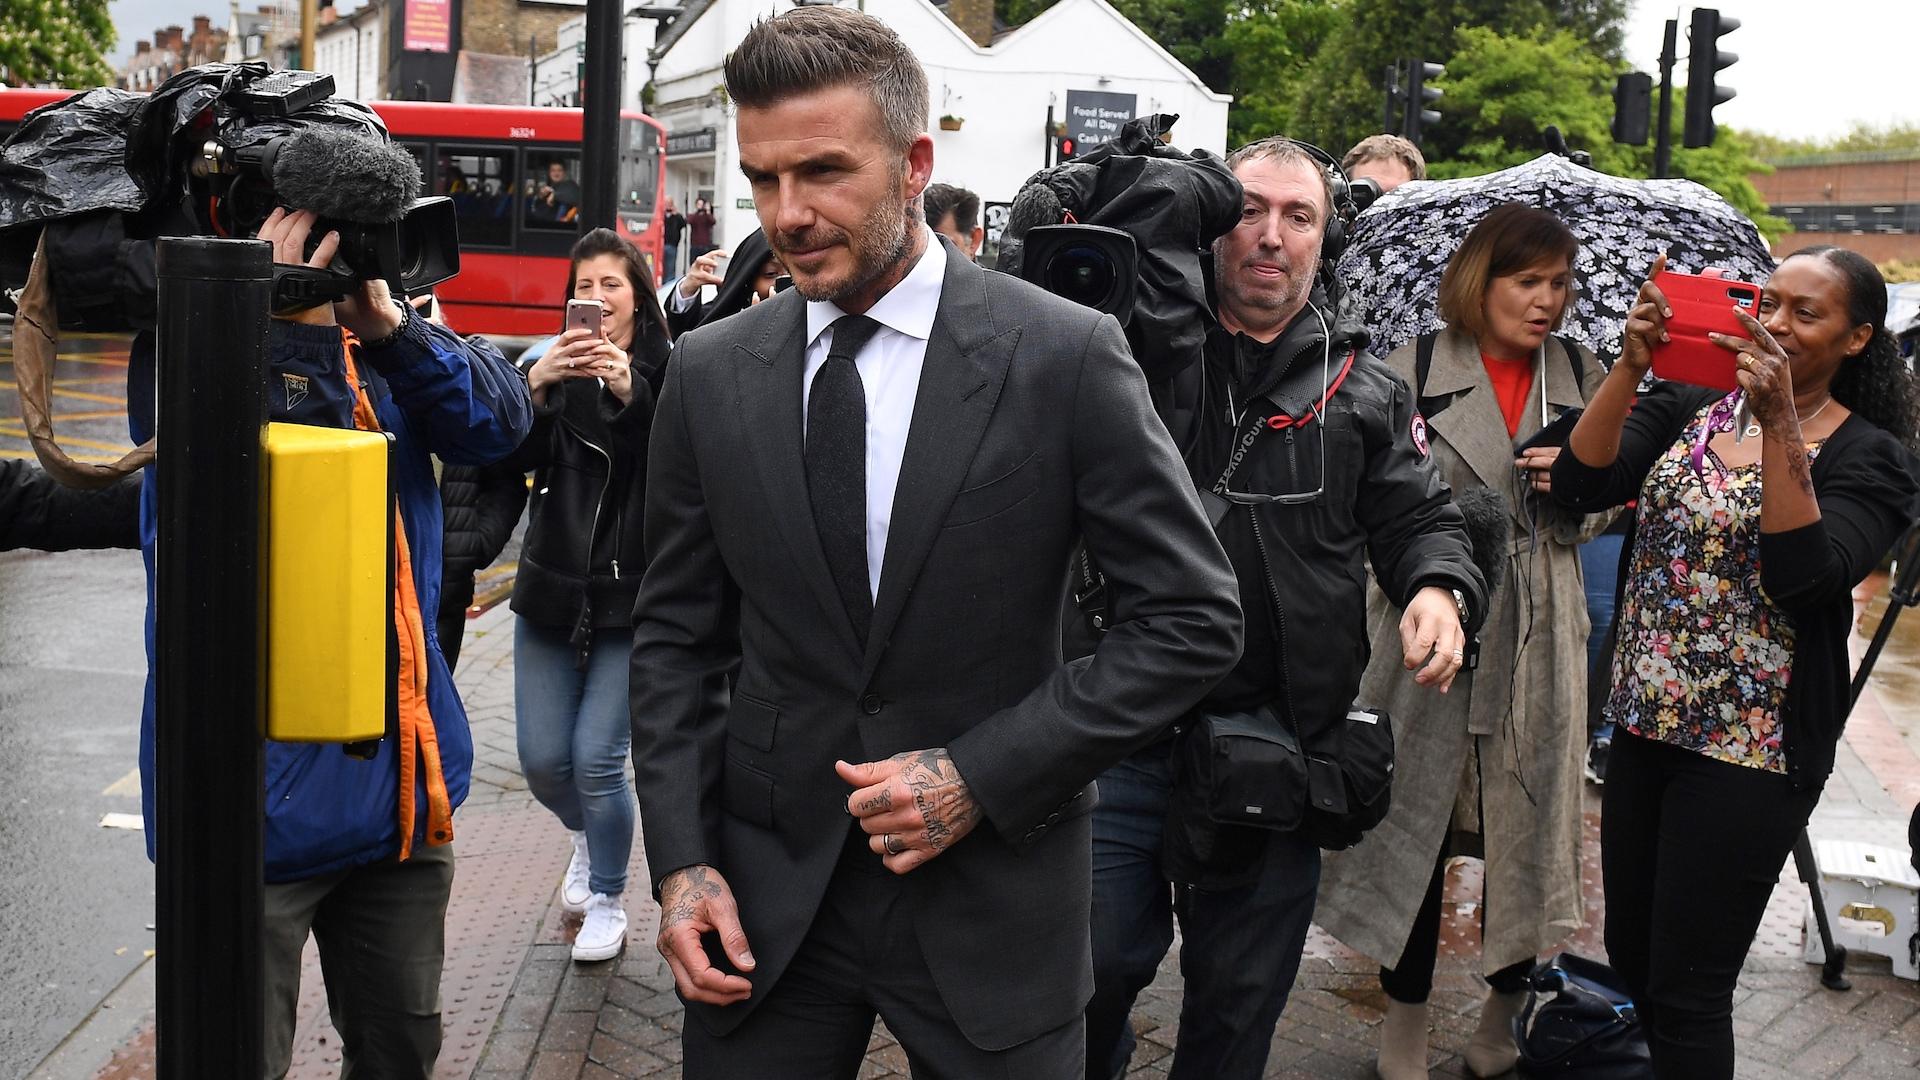 David Beckham se queda sin brevete por conducir usando el celular